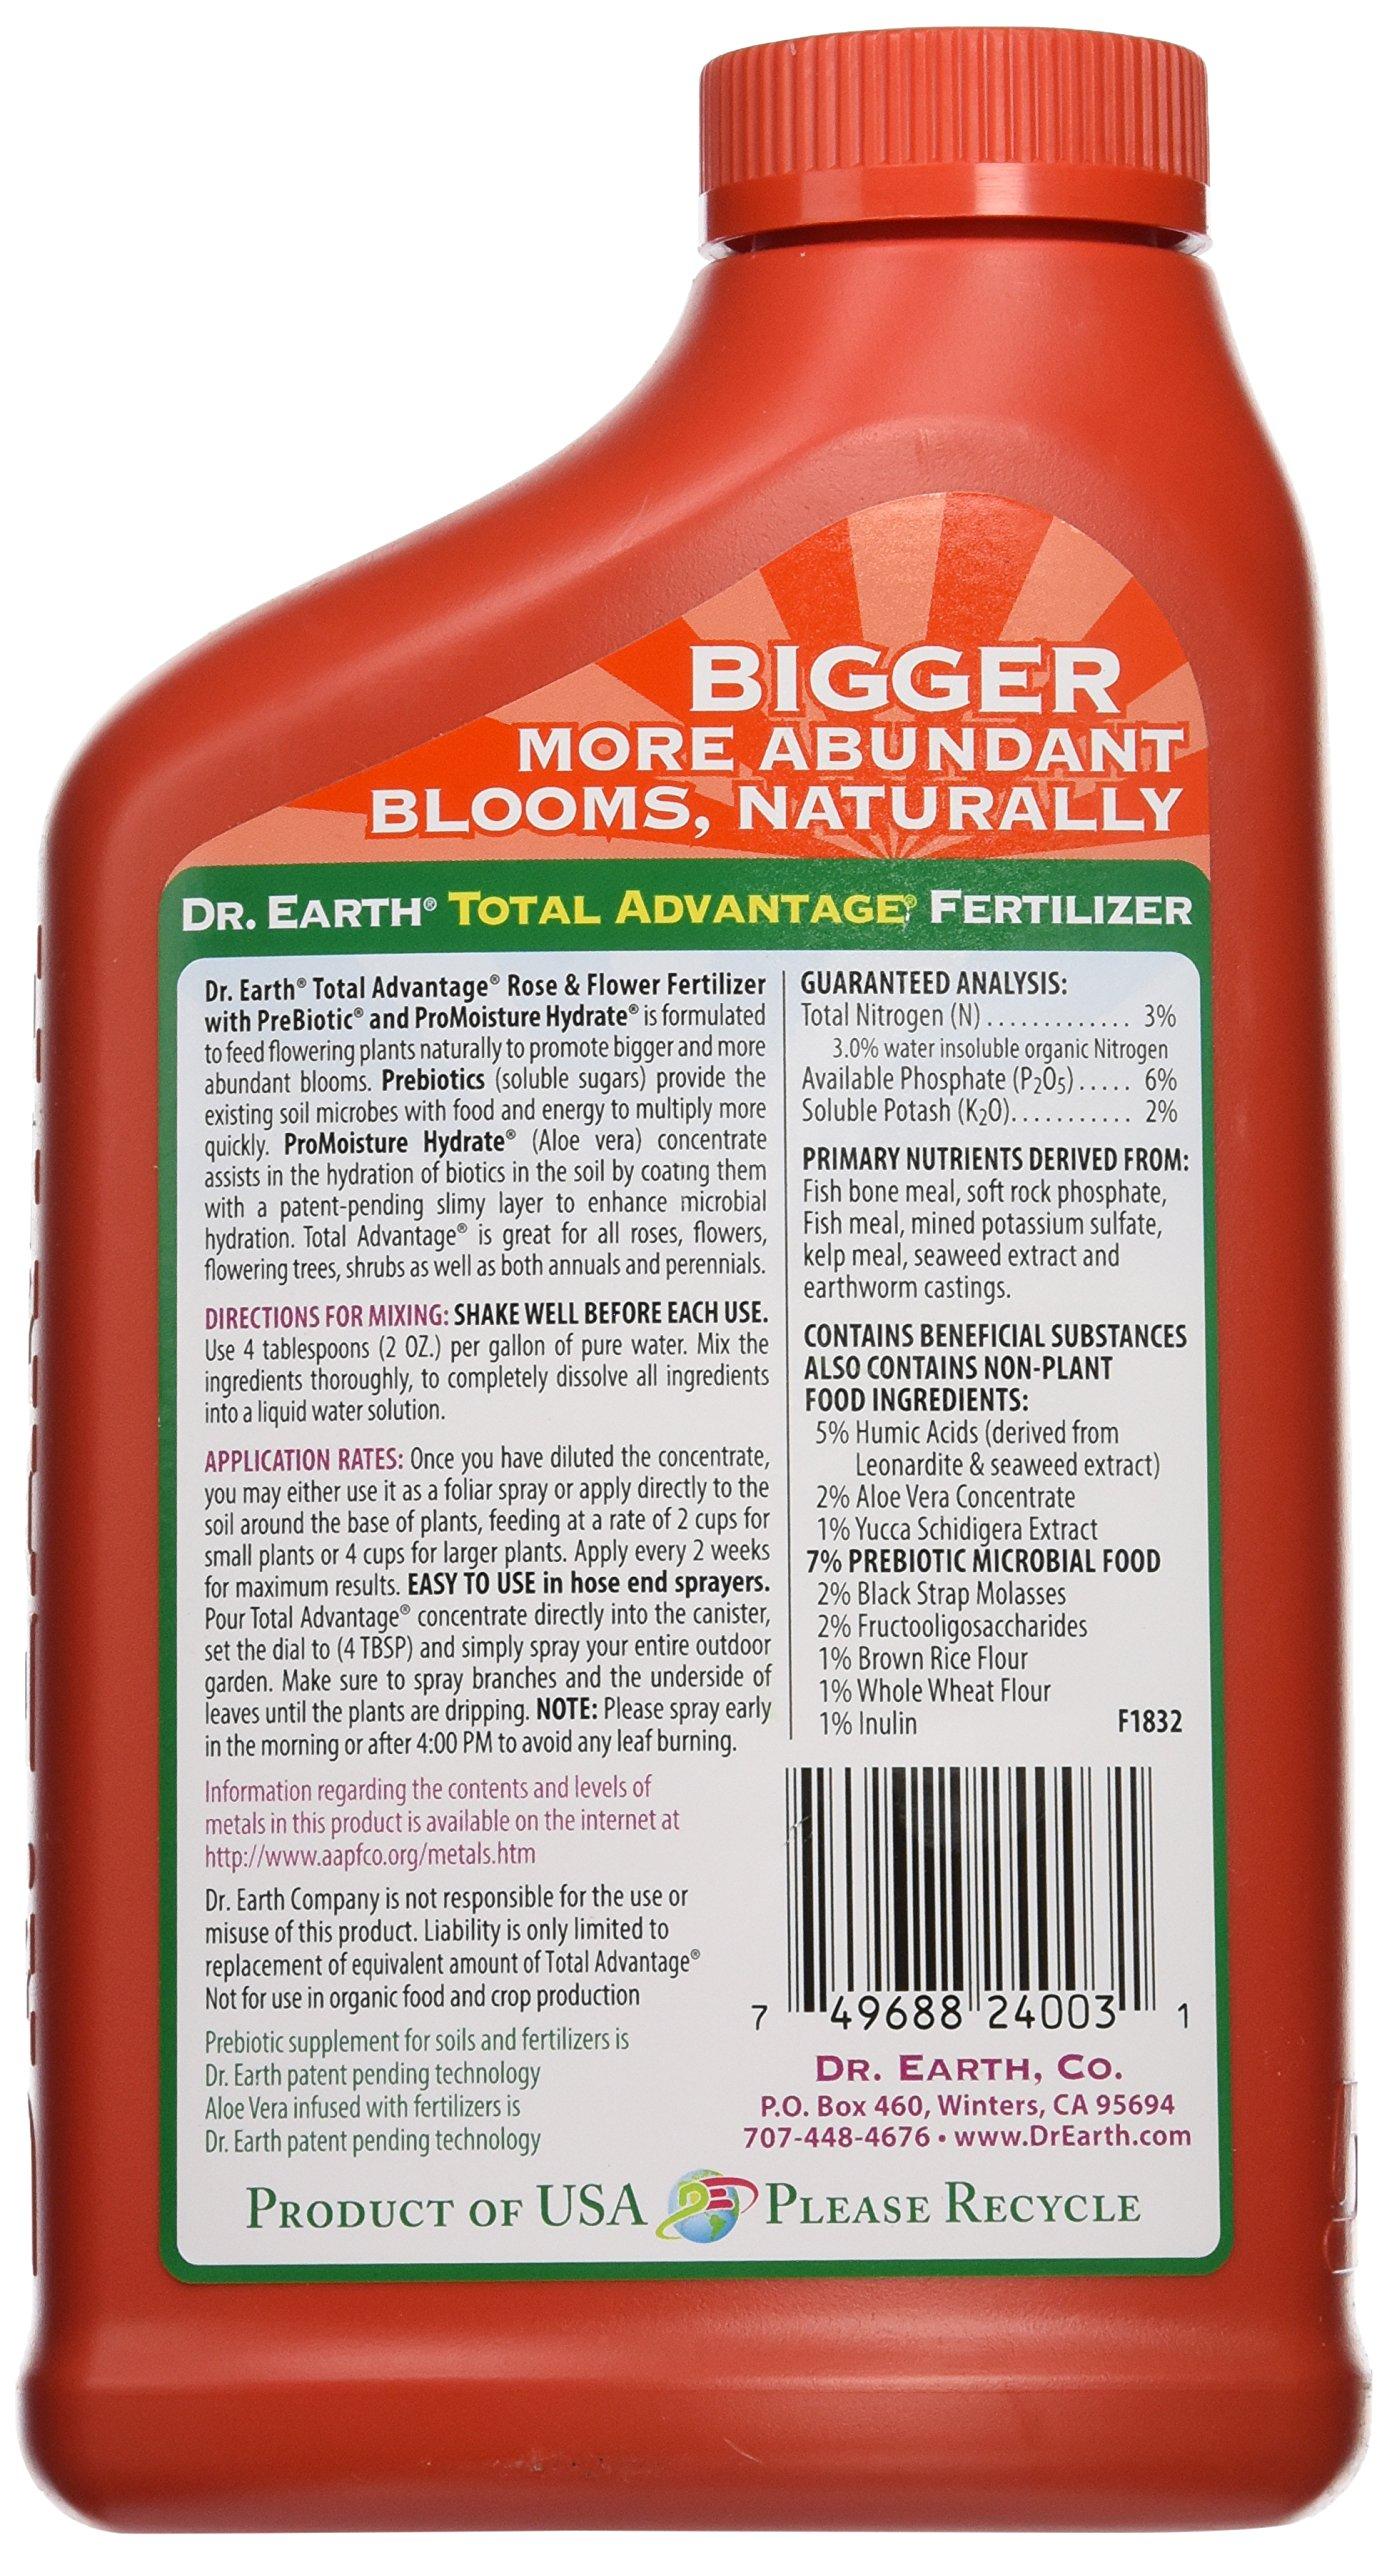 Dr. Earth Total Advantage Rose & Flower Concentrate Fertilizer, 24 oz